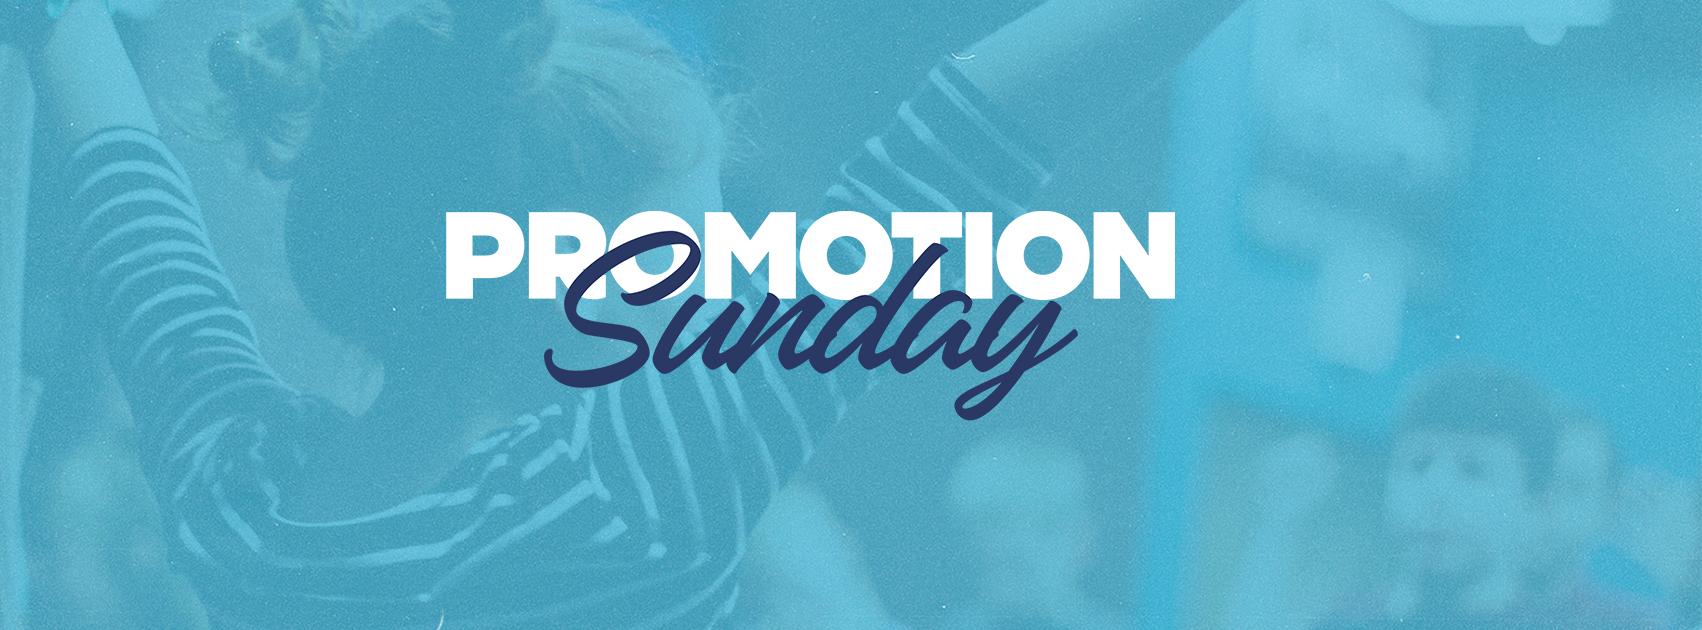 Promotion Sunday FB Cover Photo.jpg